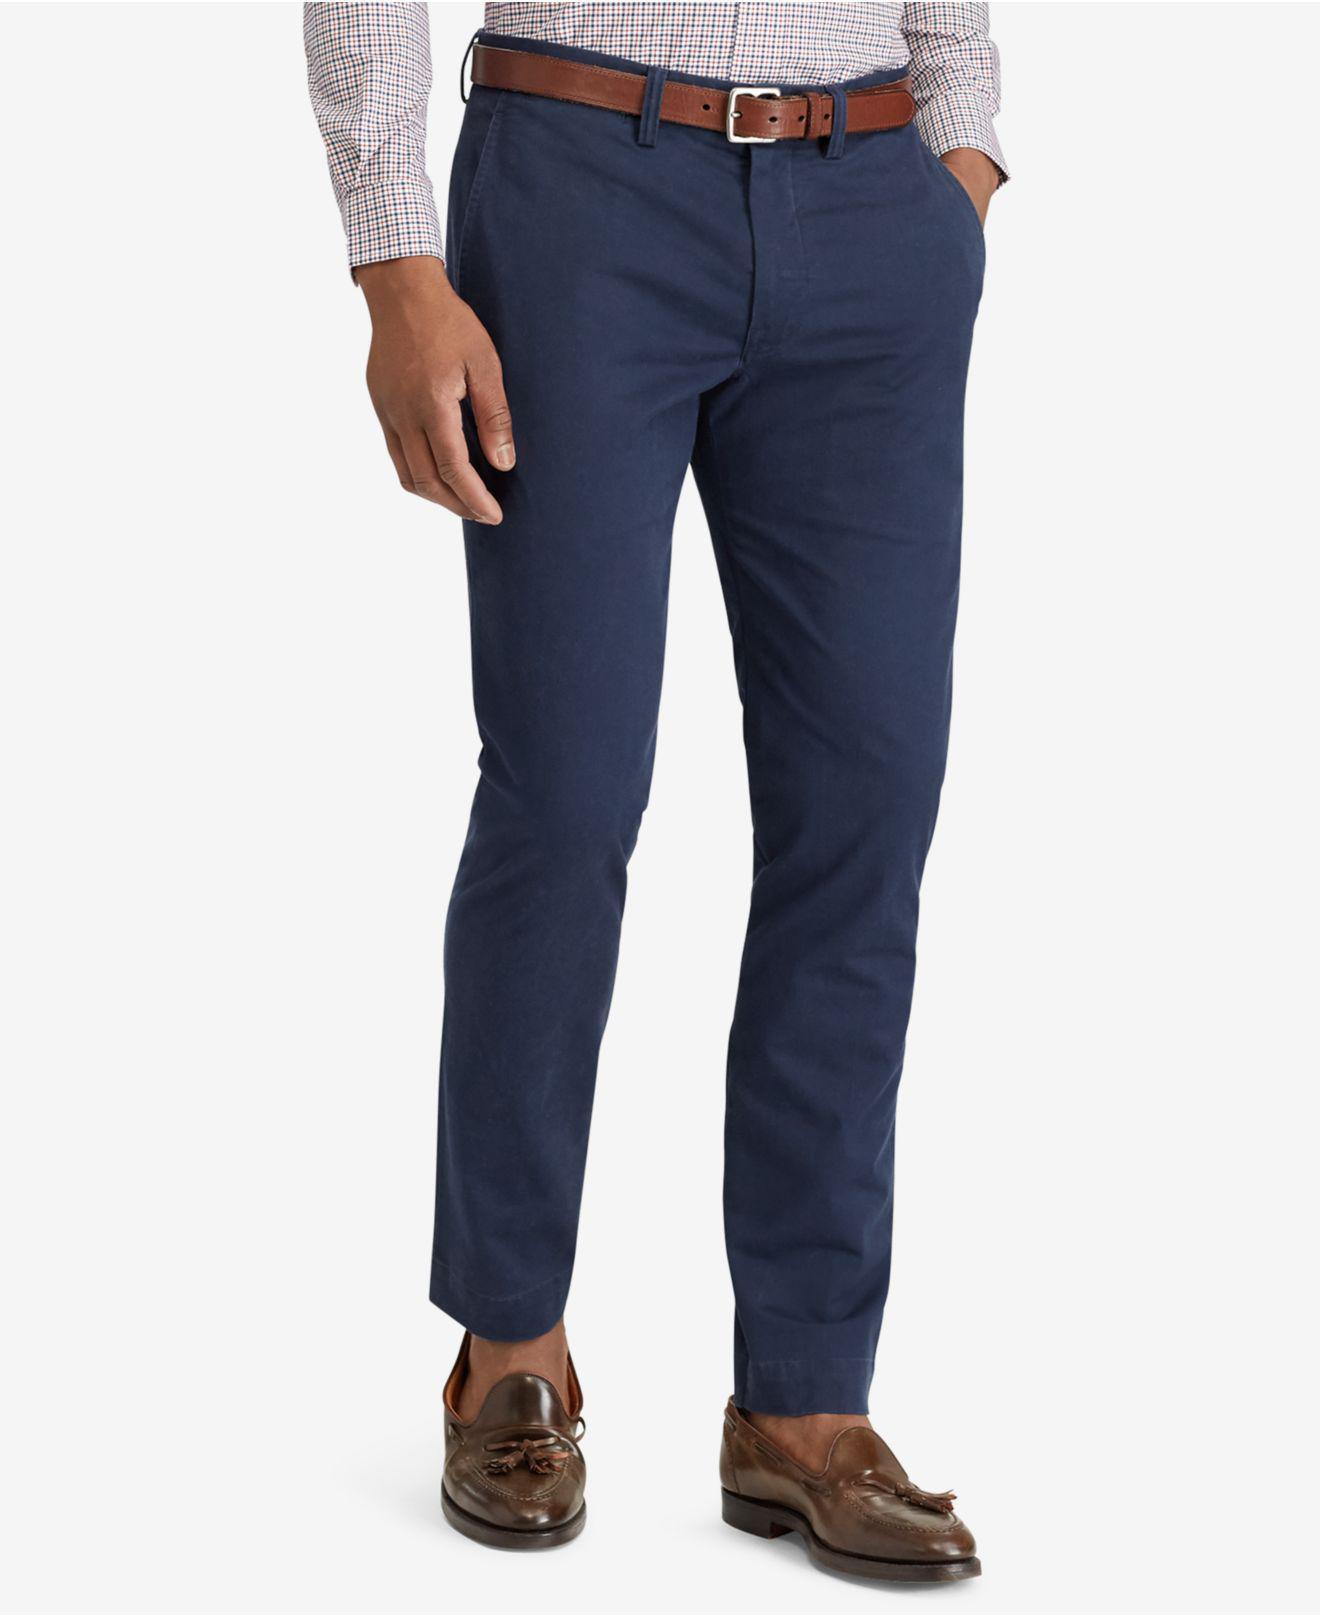 9a580b54abdb9 Polo Ralph Lauren. Blue Men s Straight-fit Bedford Stretch Chino Pants